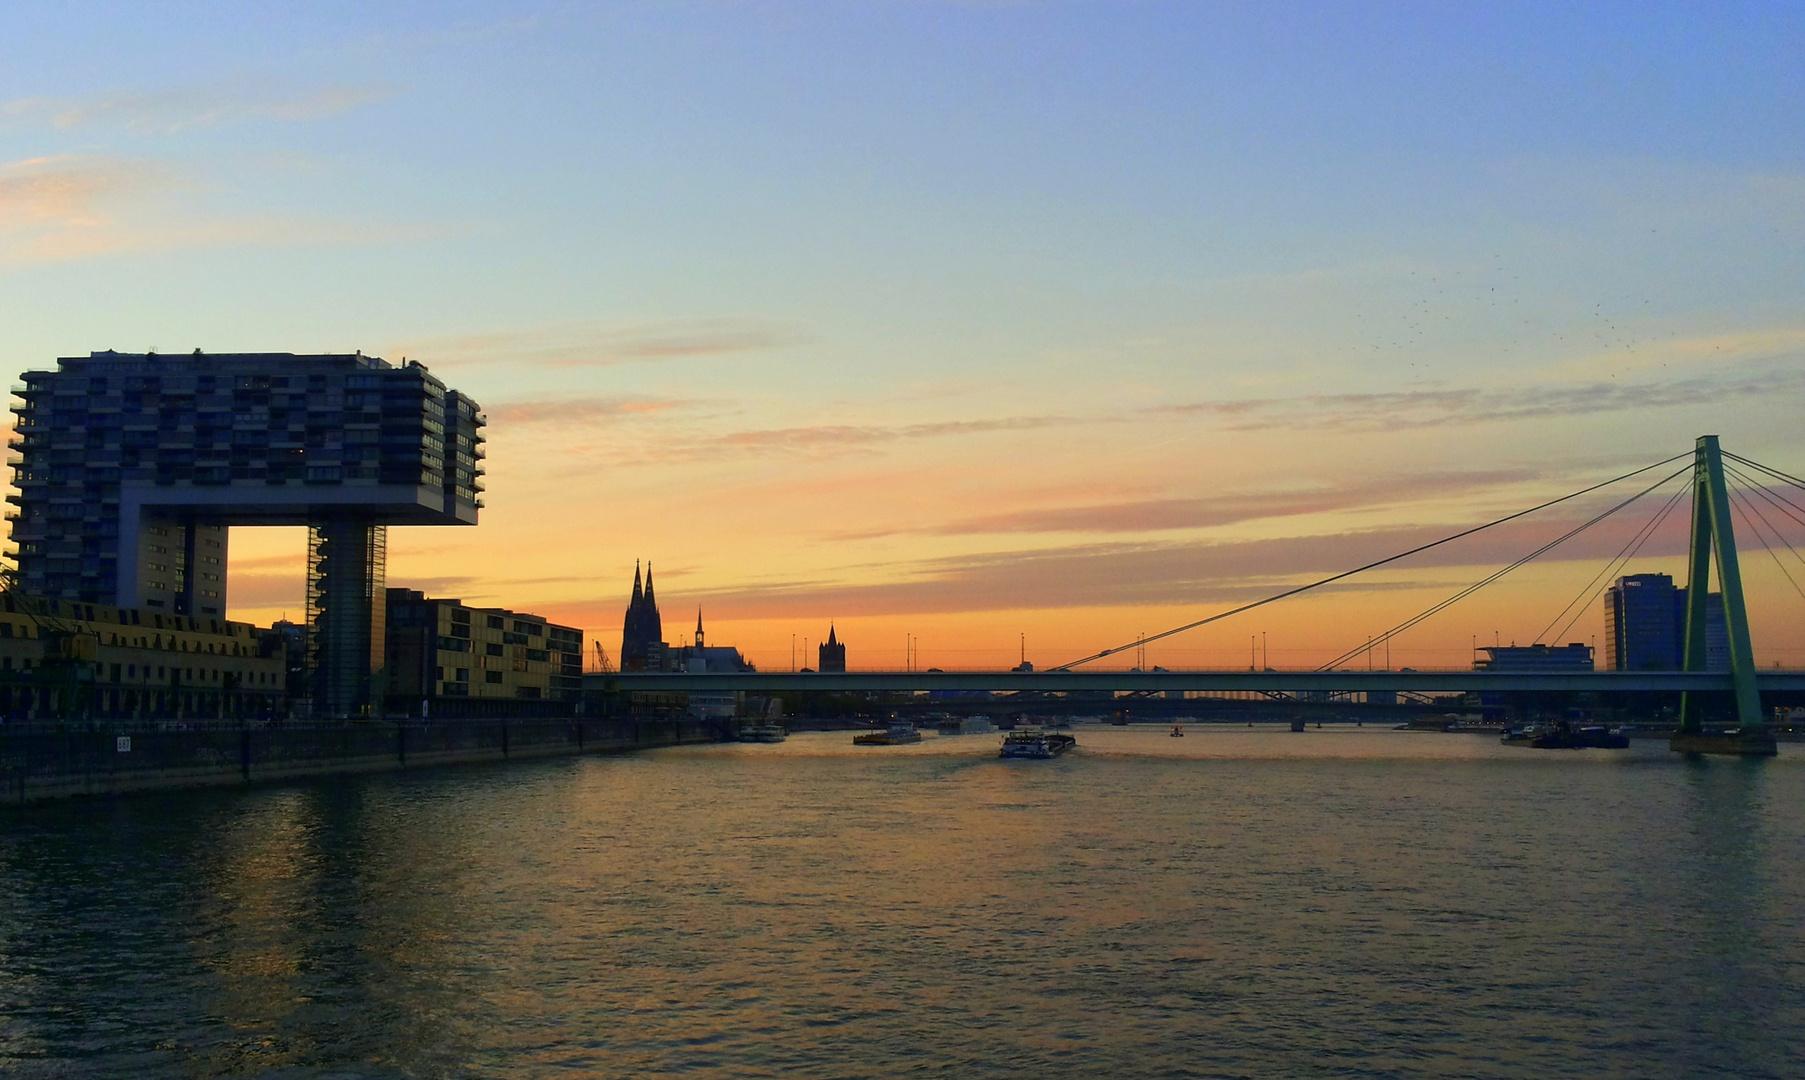 auf dem Rhein nahe Köln